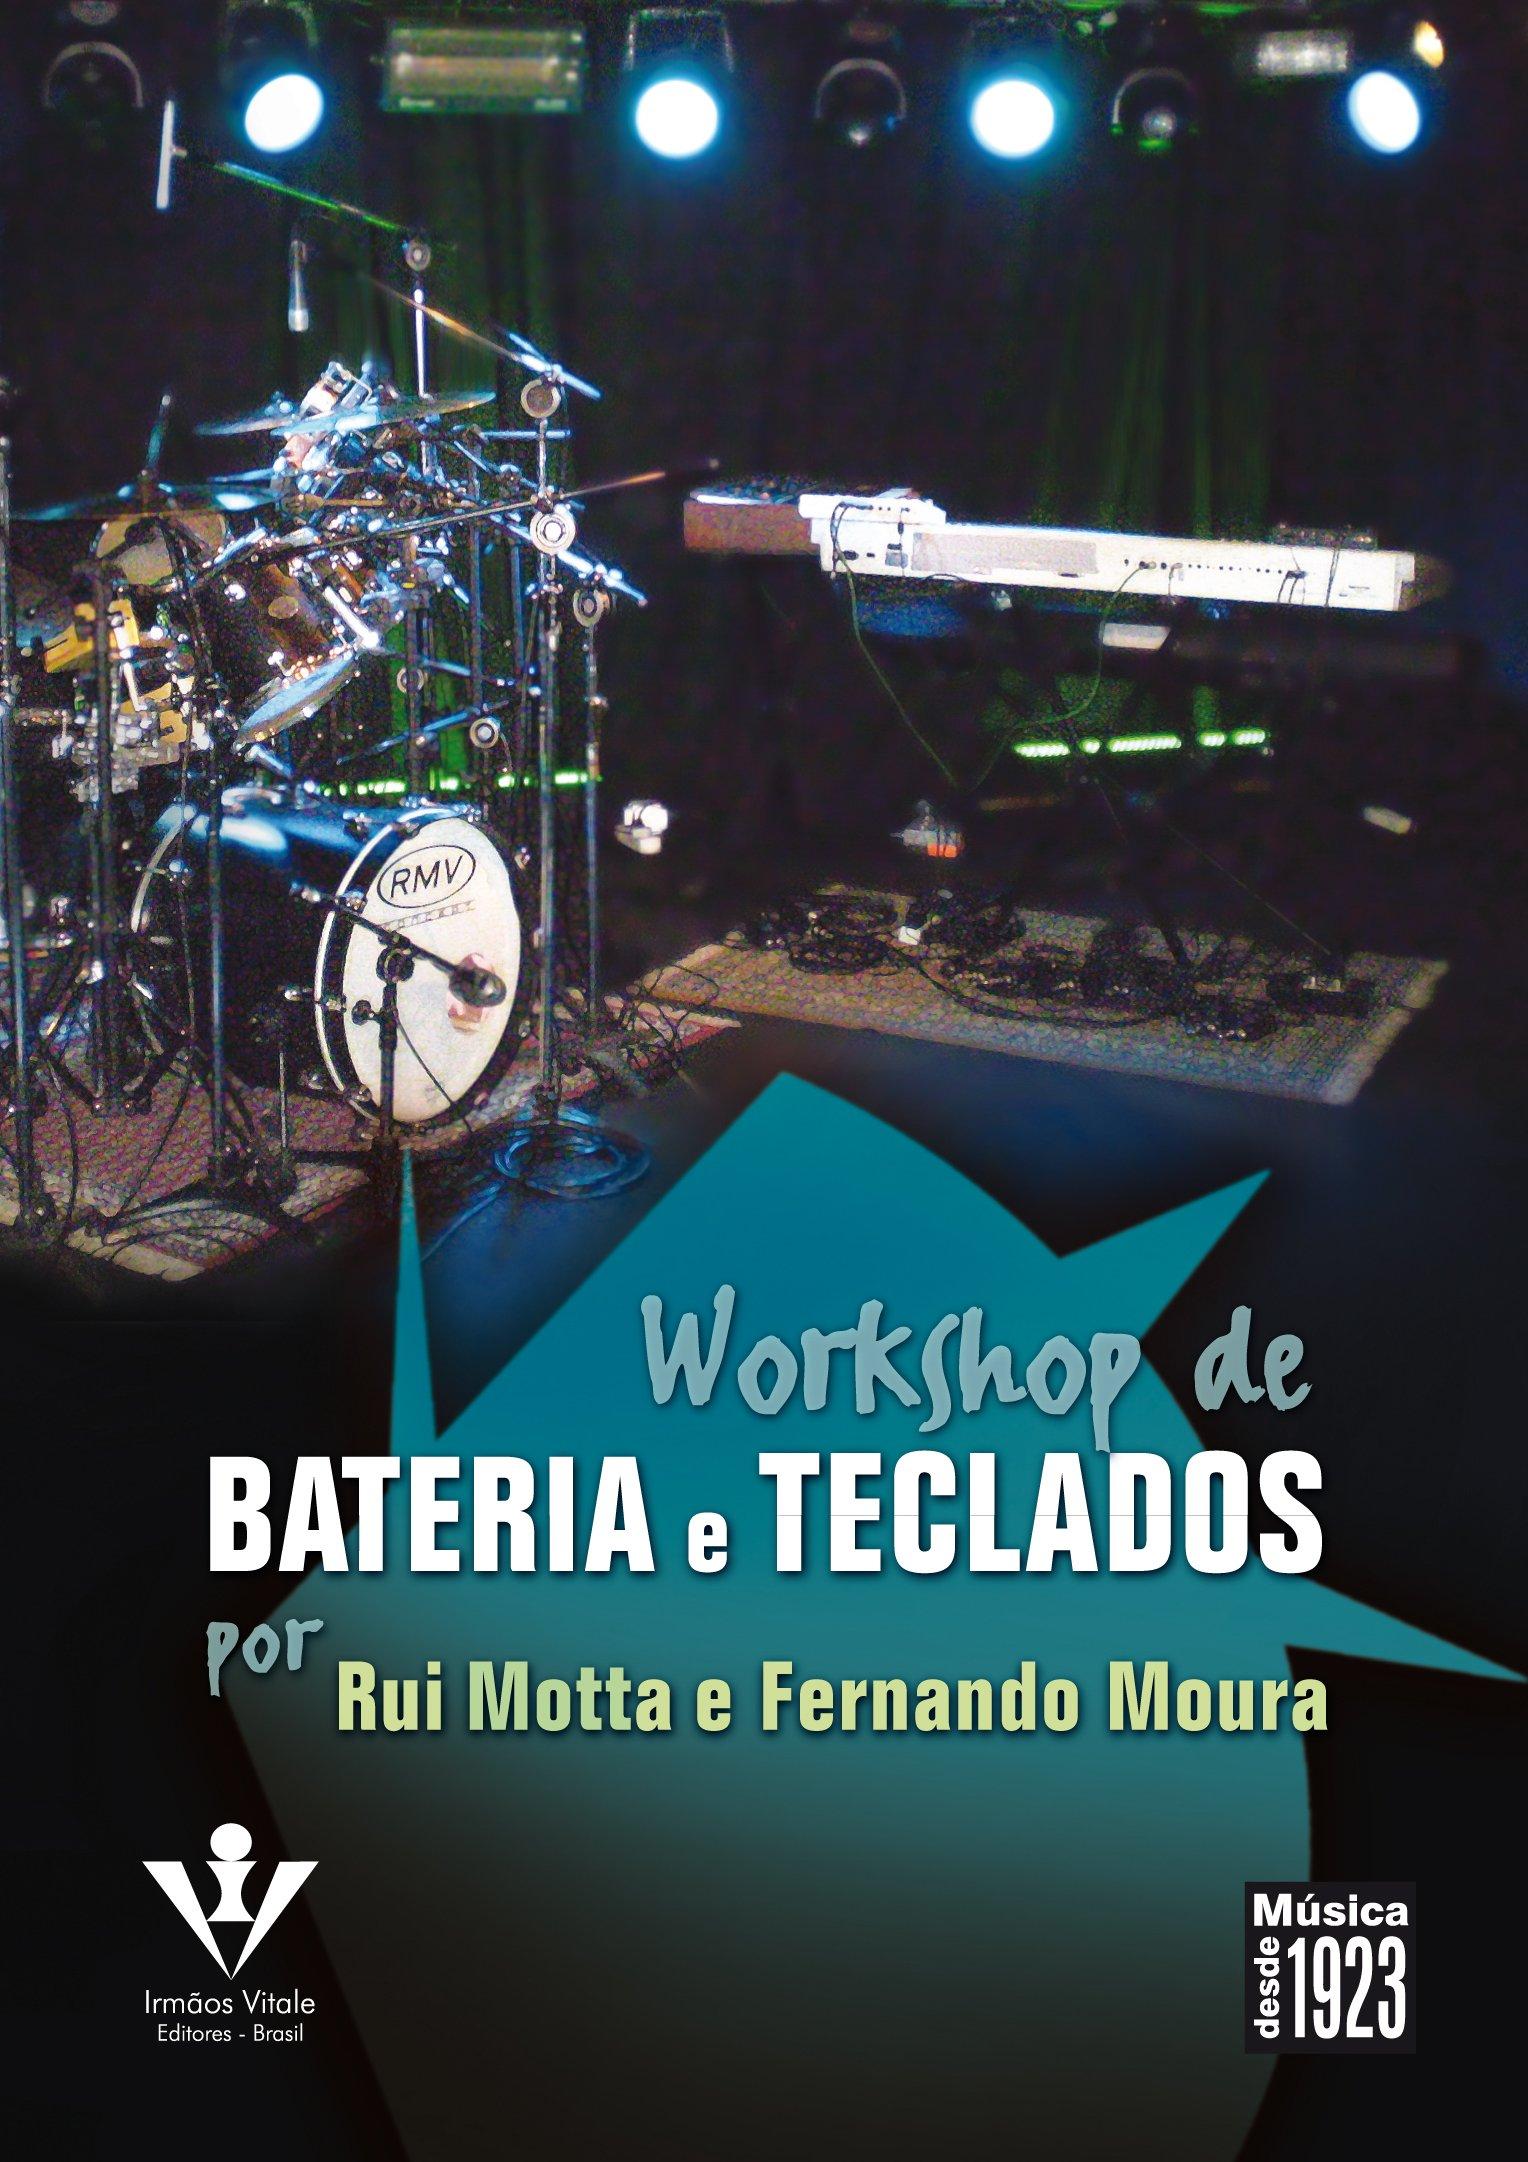 Workshop De Bateria E Teclados - Dvd (Portuguese Brazilian) Paperback – 2000